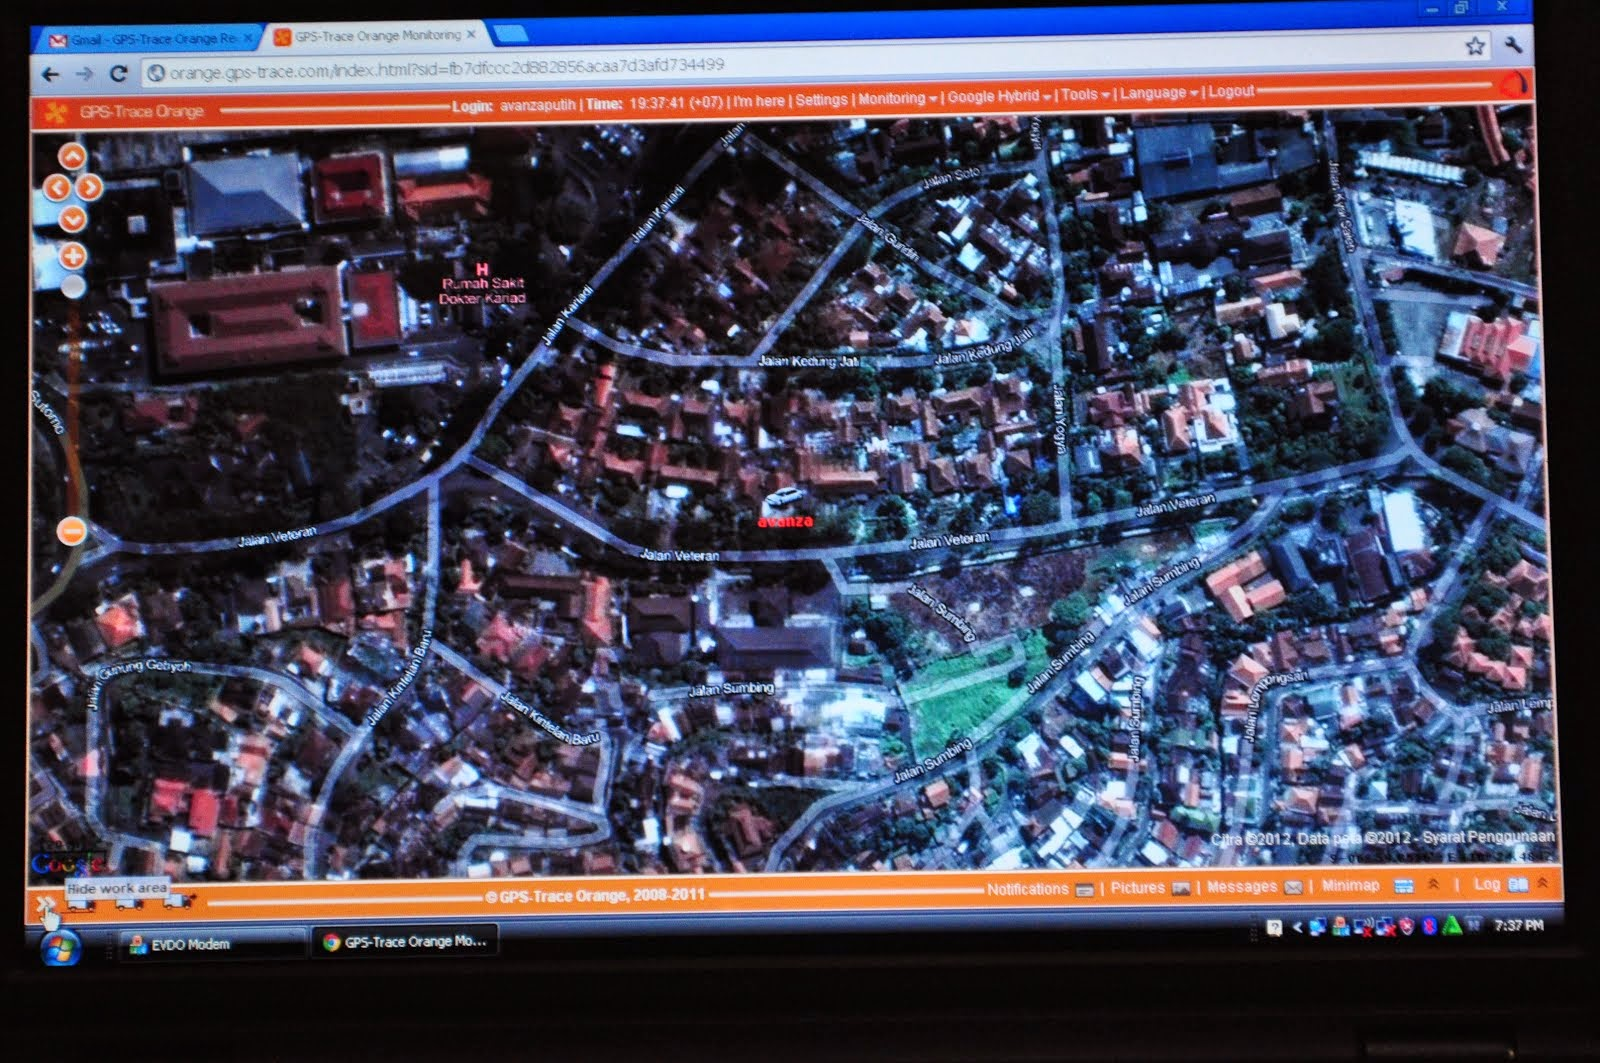 Cara daftar GPS Tracker di Trace Orange